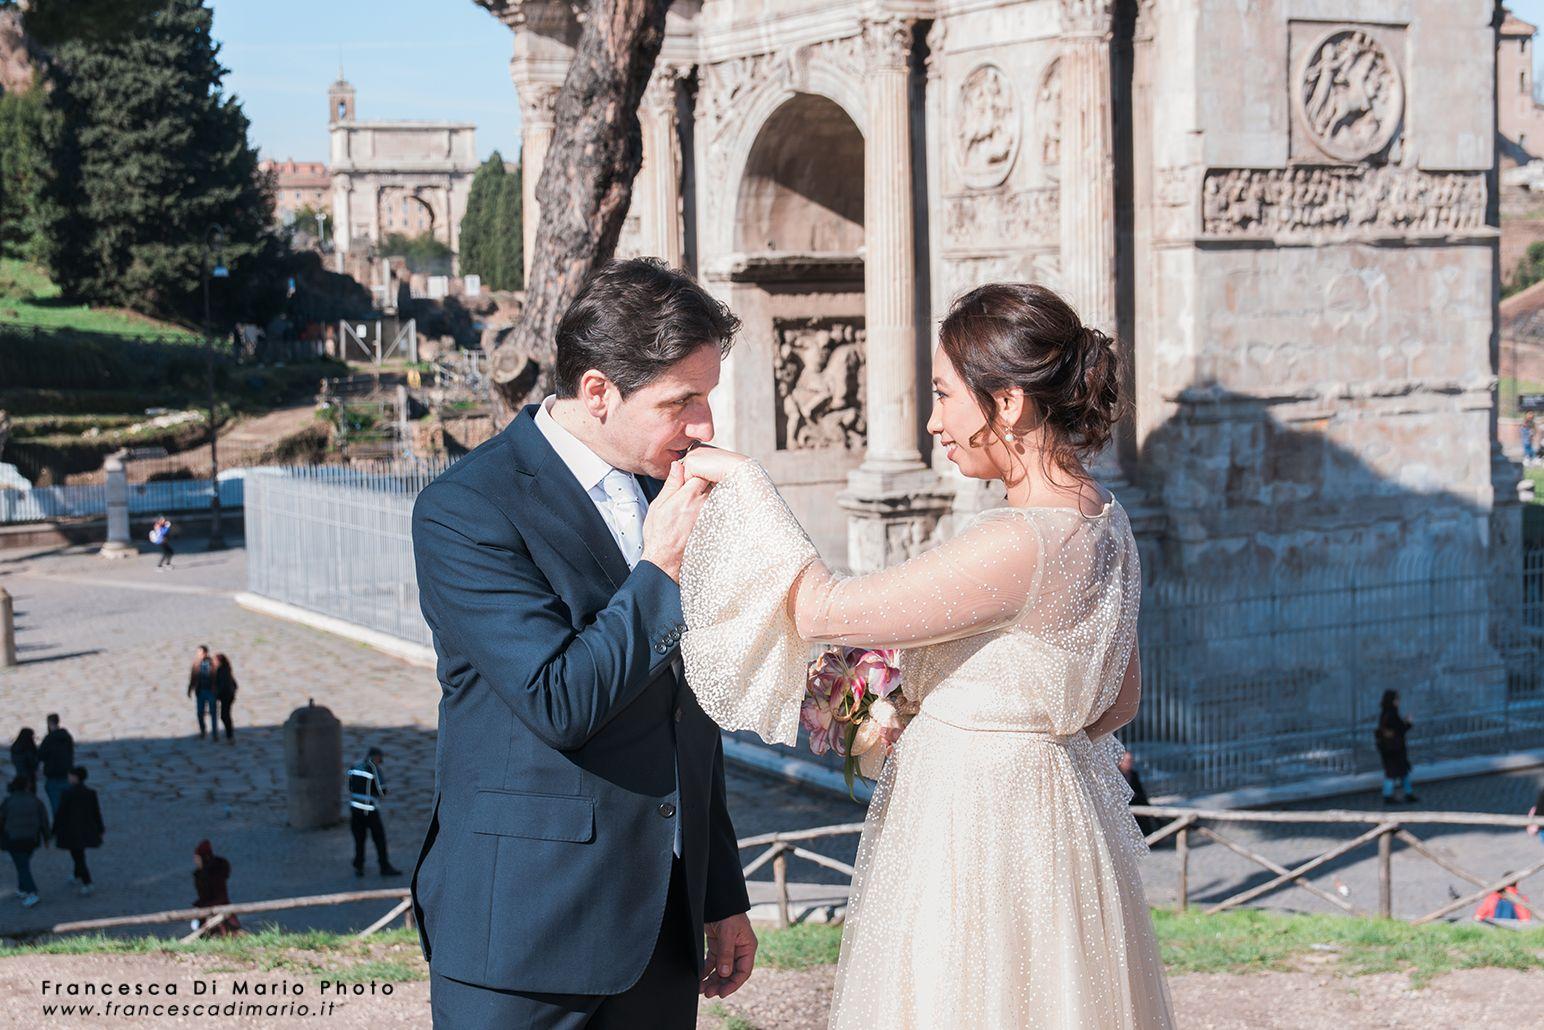 Fotografo Matrimoni Roma Nel 2020 Matrimonio Fotografo Studio Fotografico